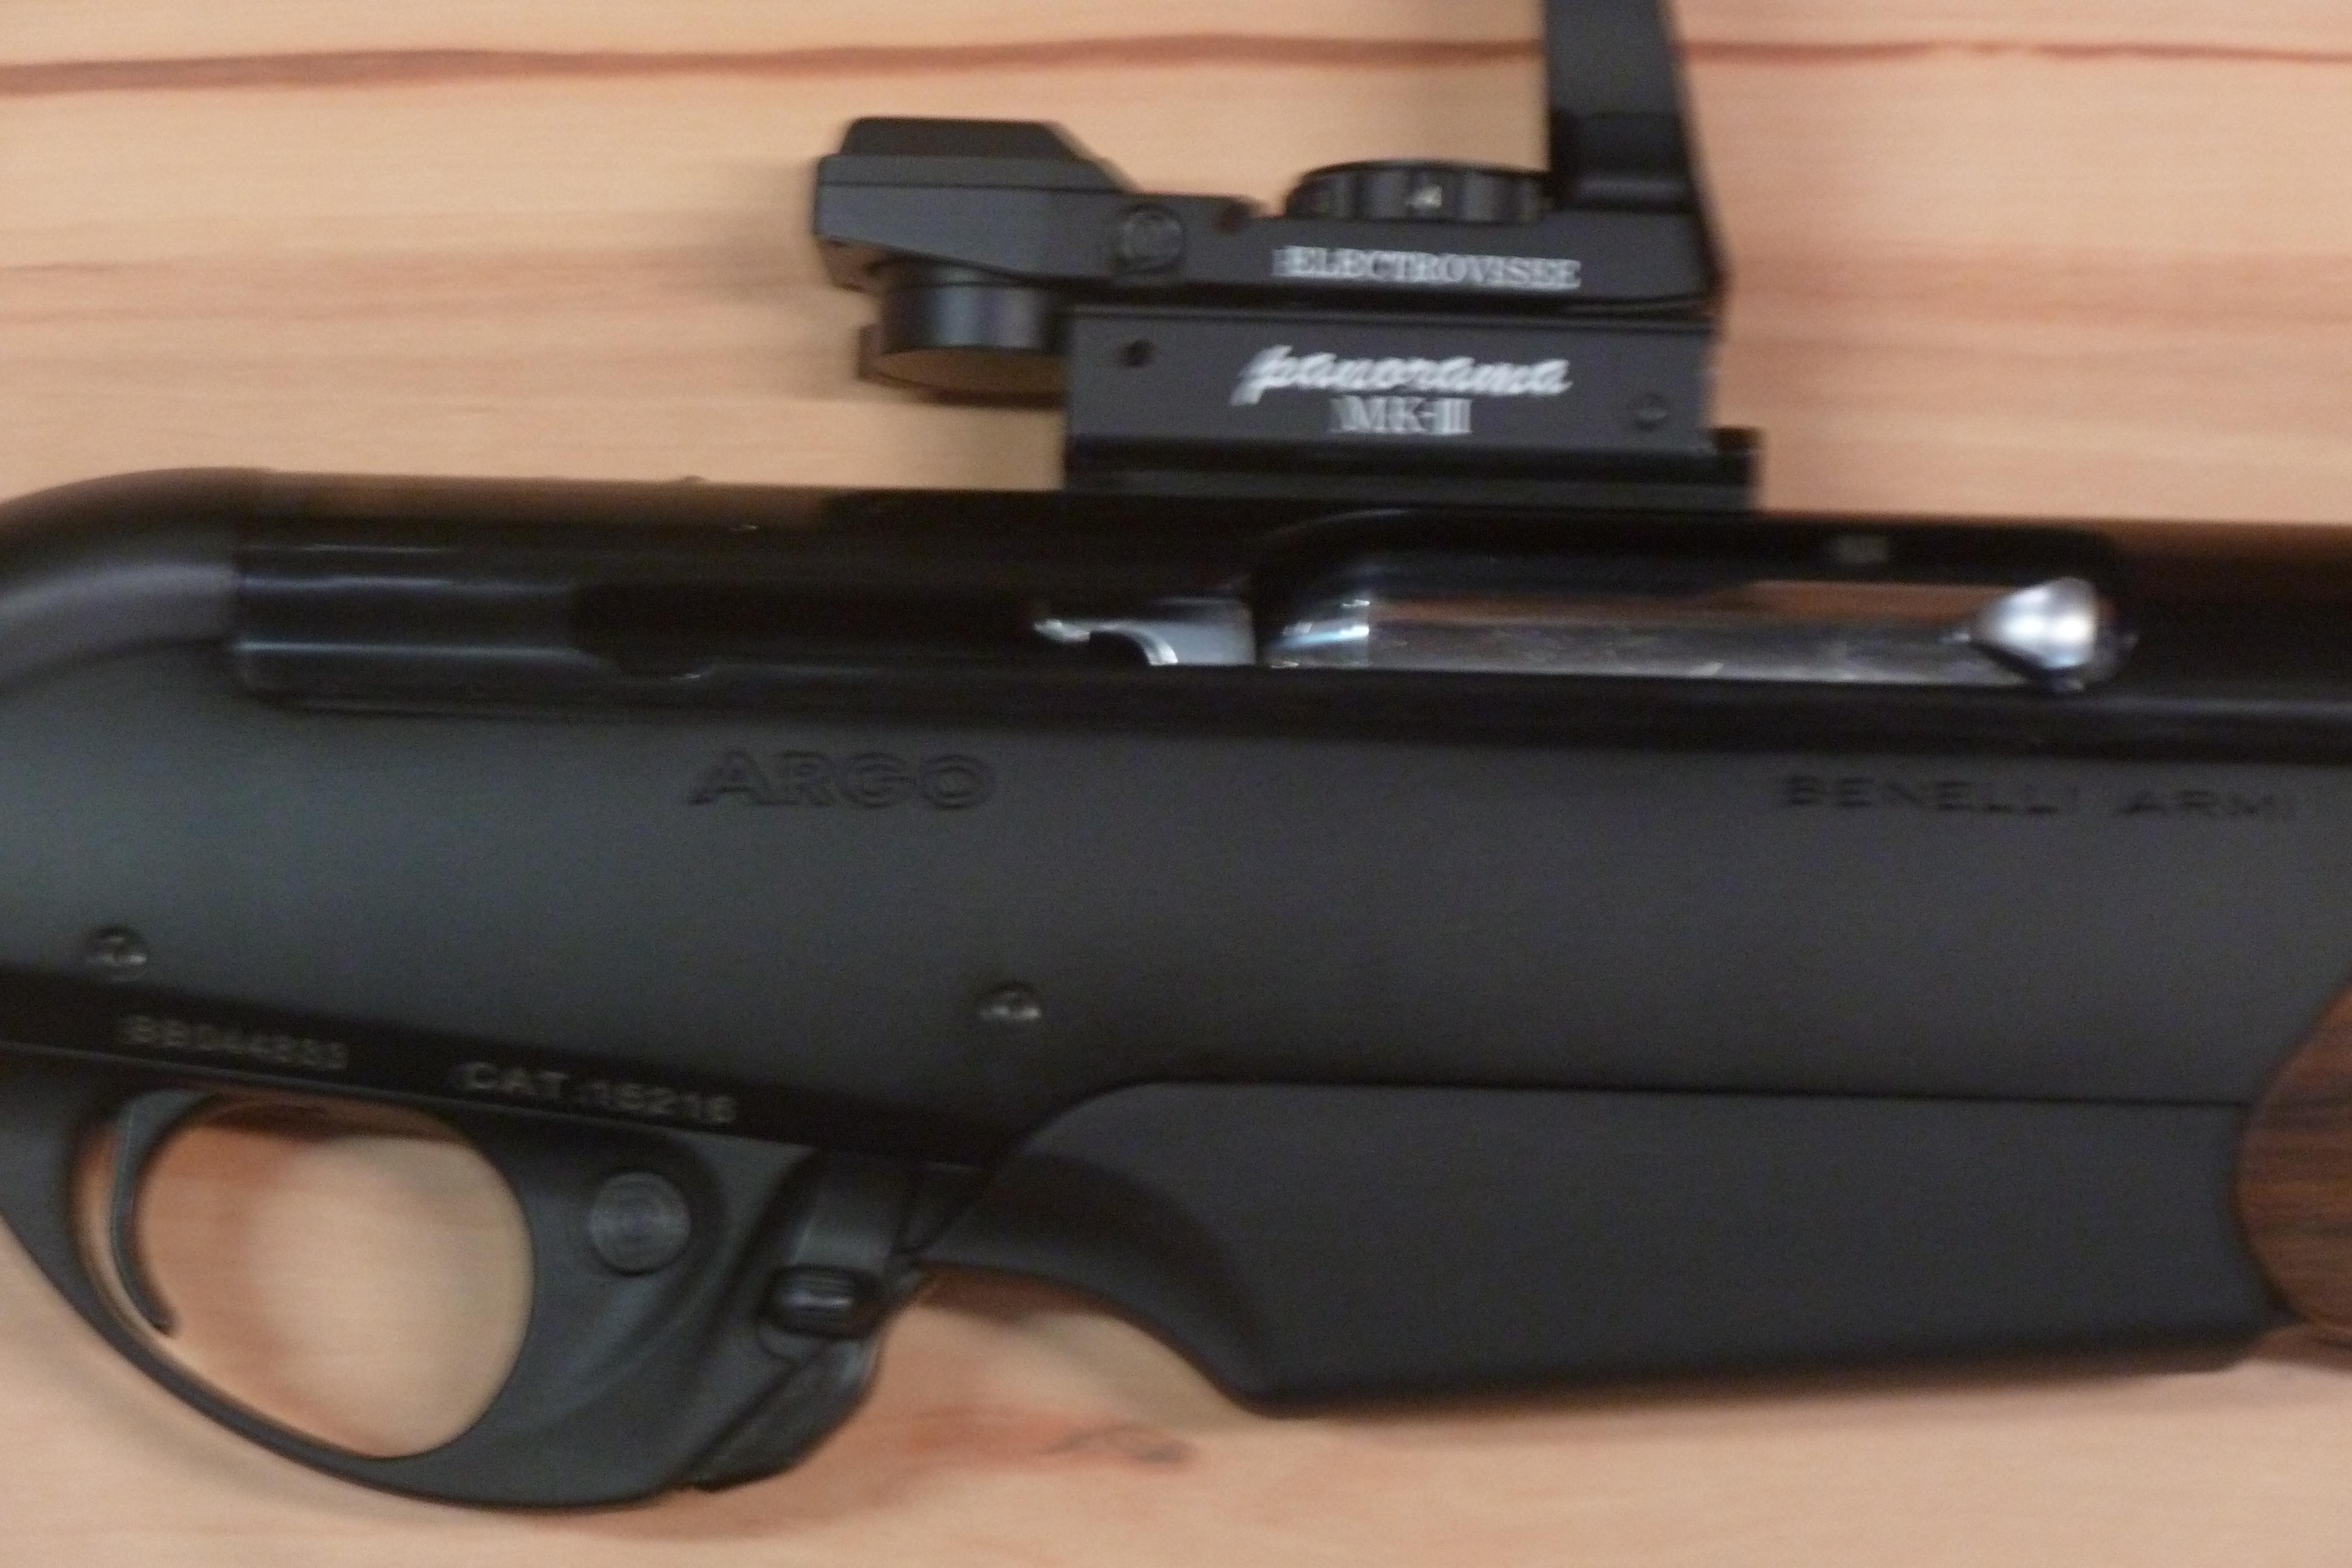 Carabines 22lr d occasion armes de loisirs chasse peche - Arme occasion particulier ...